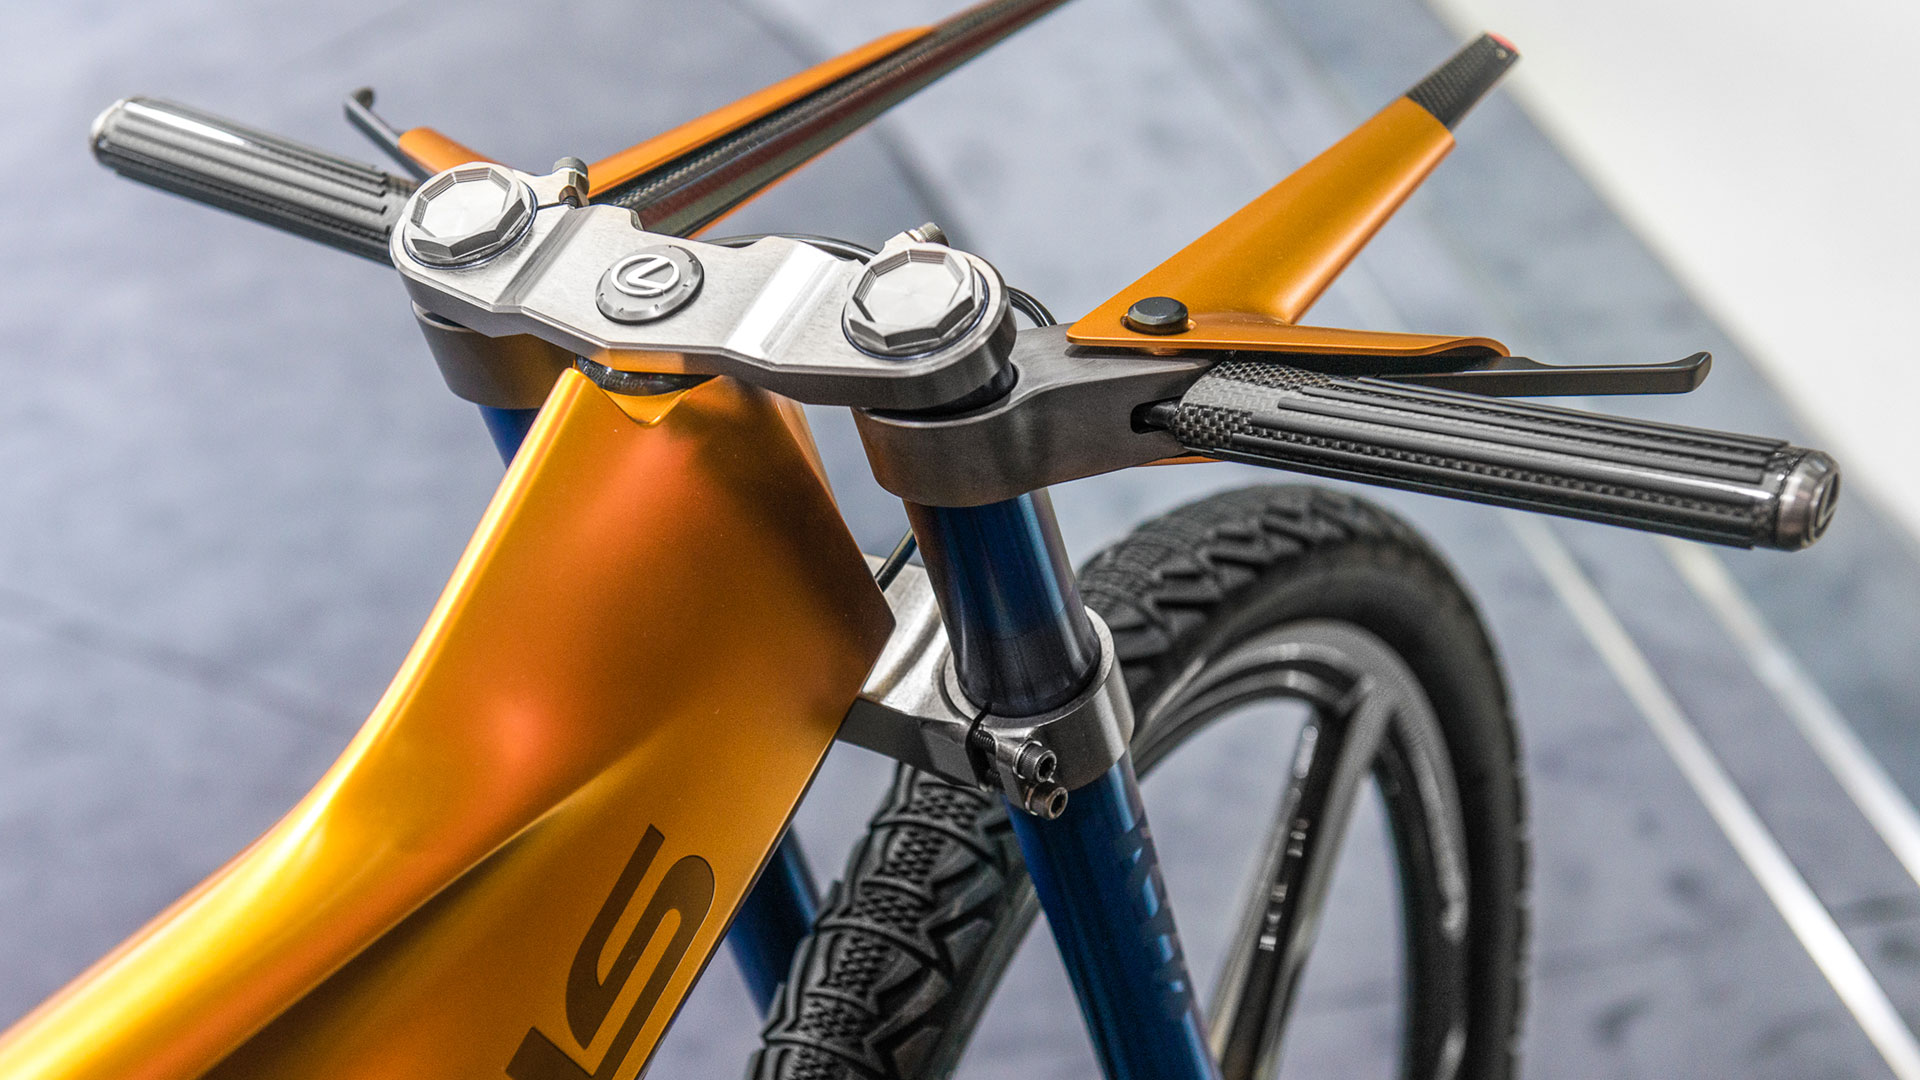 Lexus F SPORT Bike hero asset